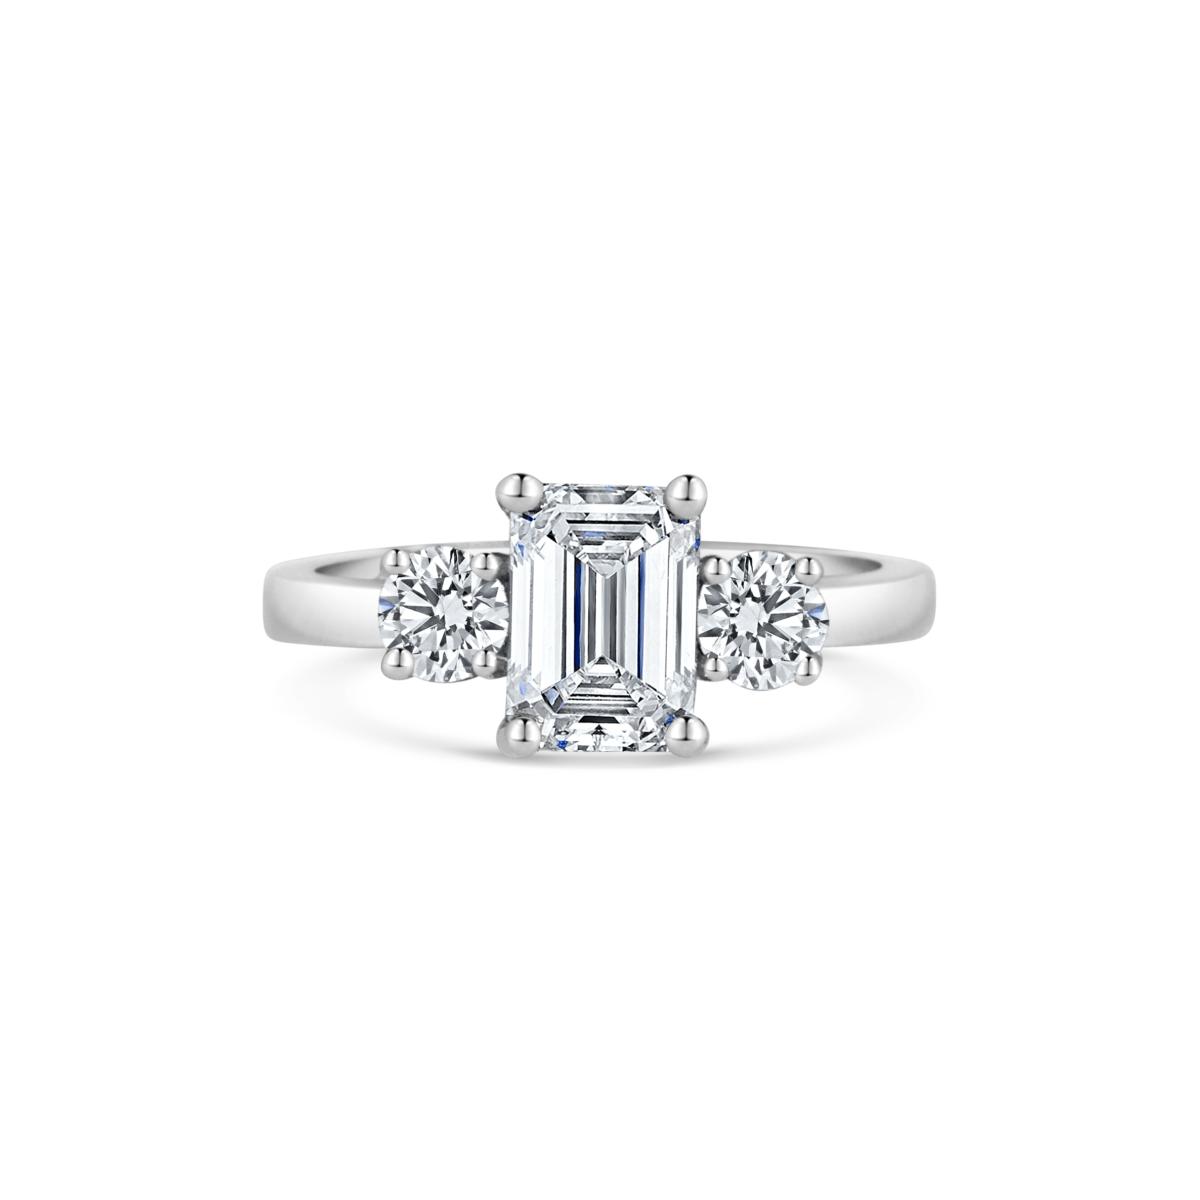 Floria Emerald & Round Diamond Three Stone Engagement Ring Front View